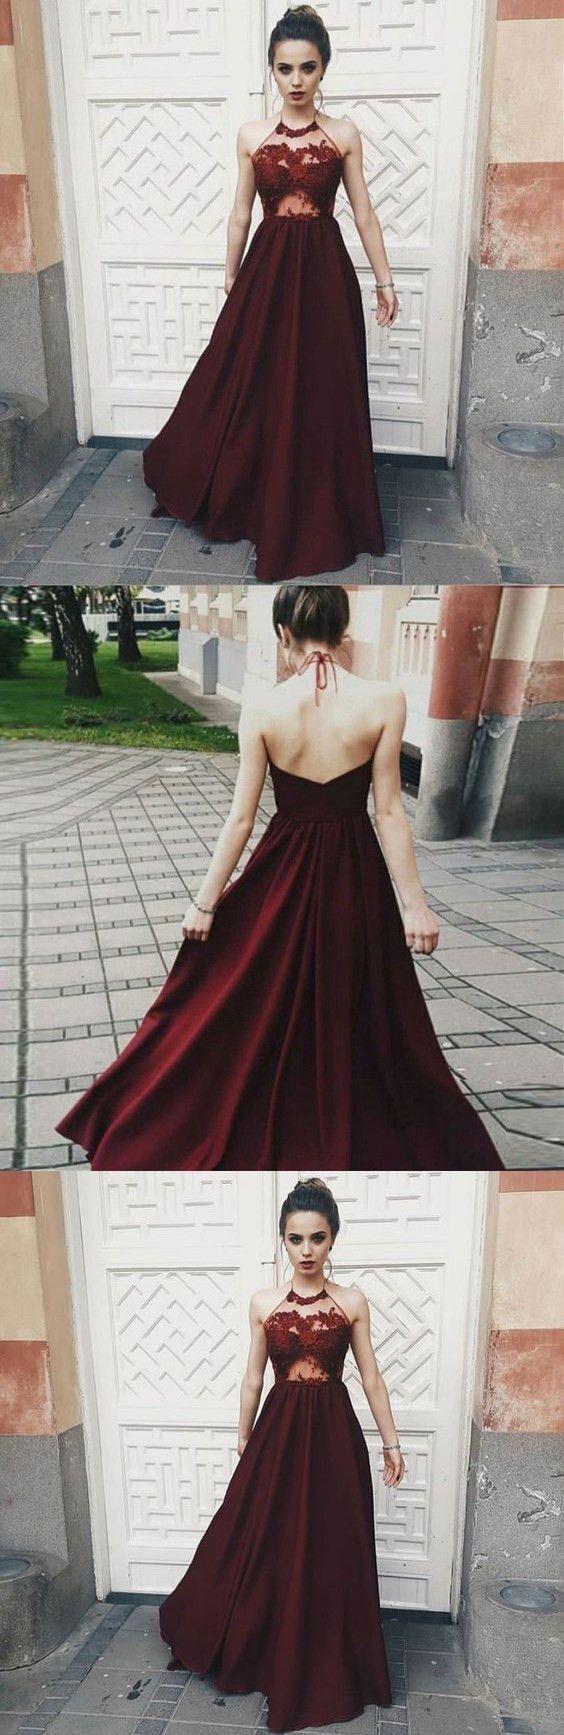 prom dresses aline spaghetti straps burgundy long prom dress